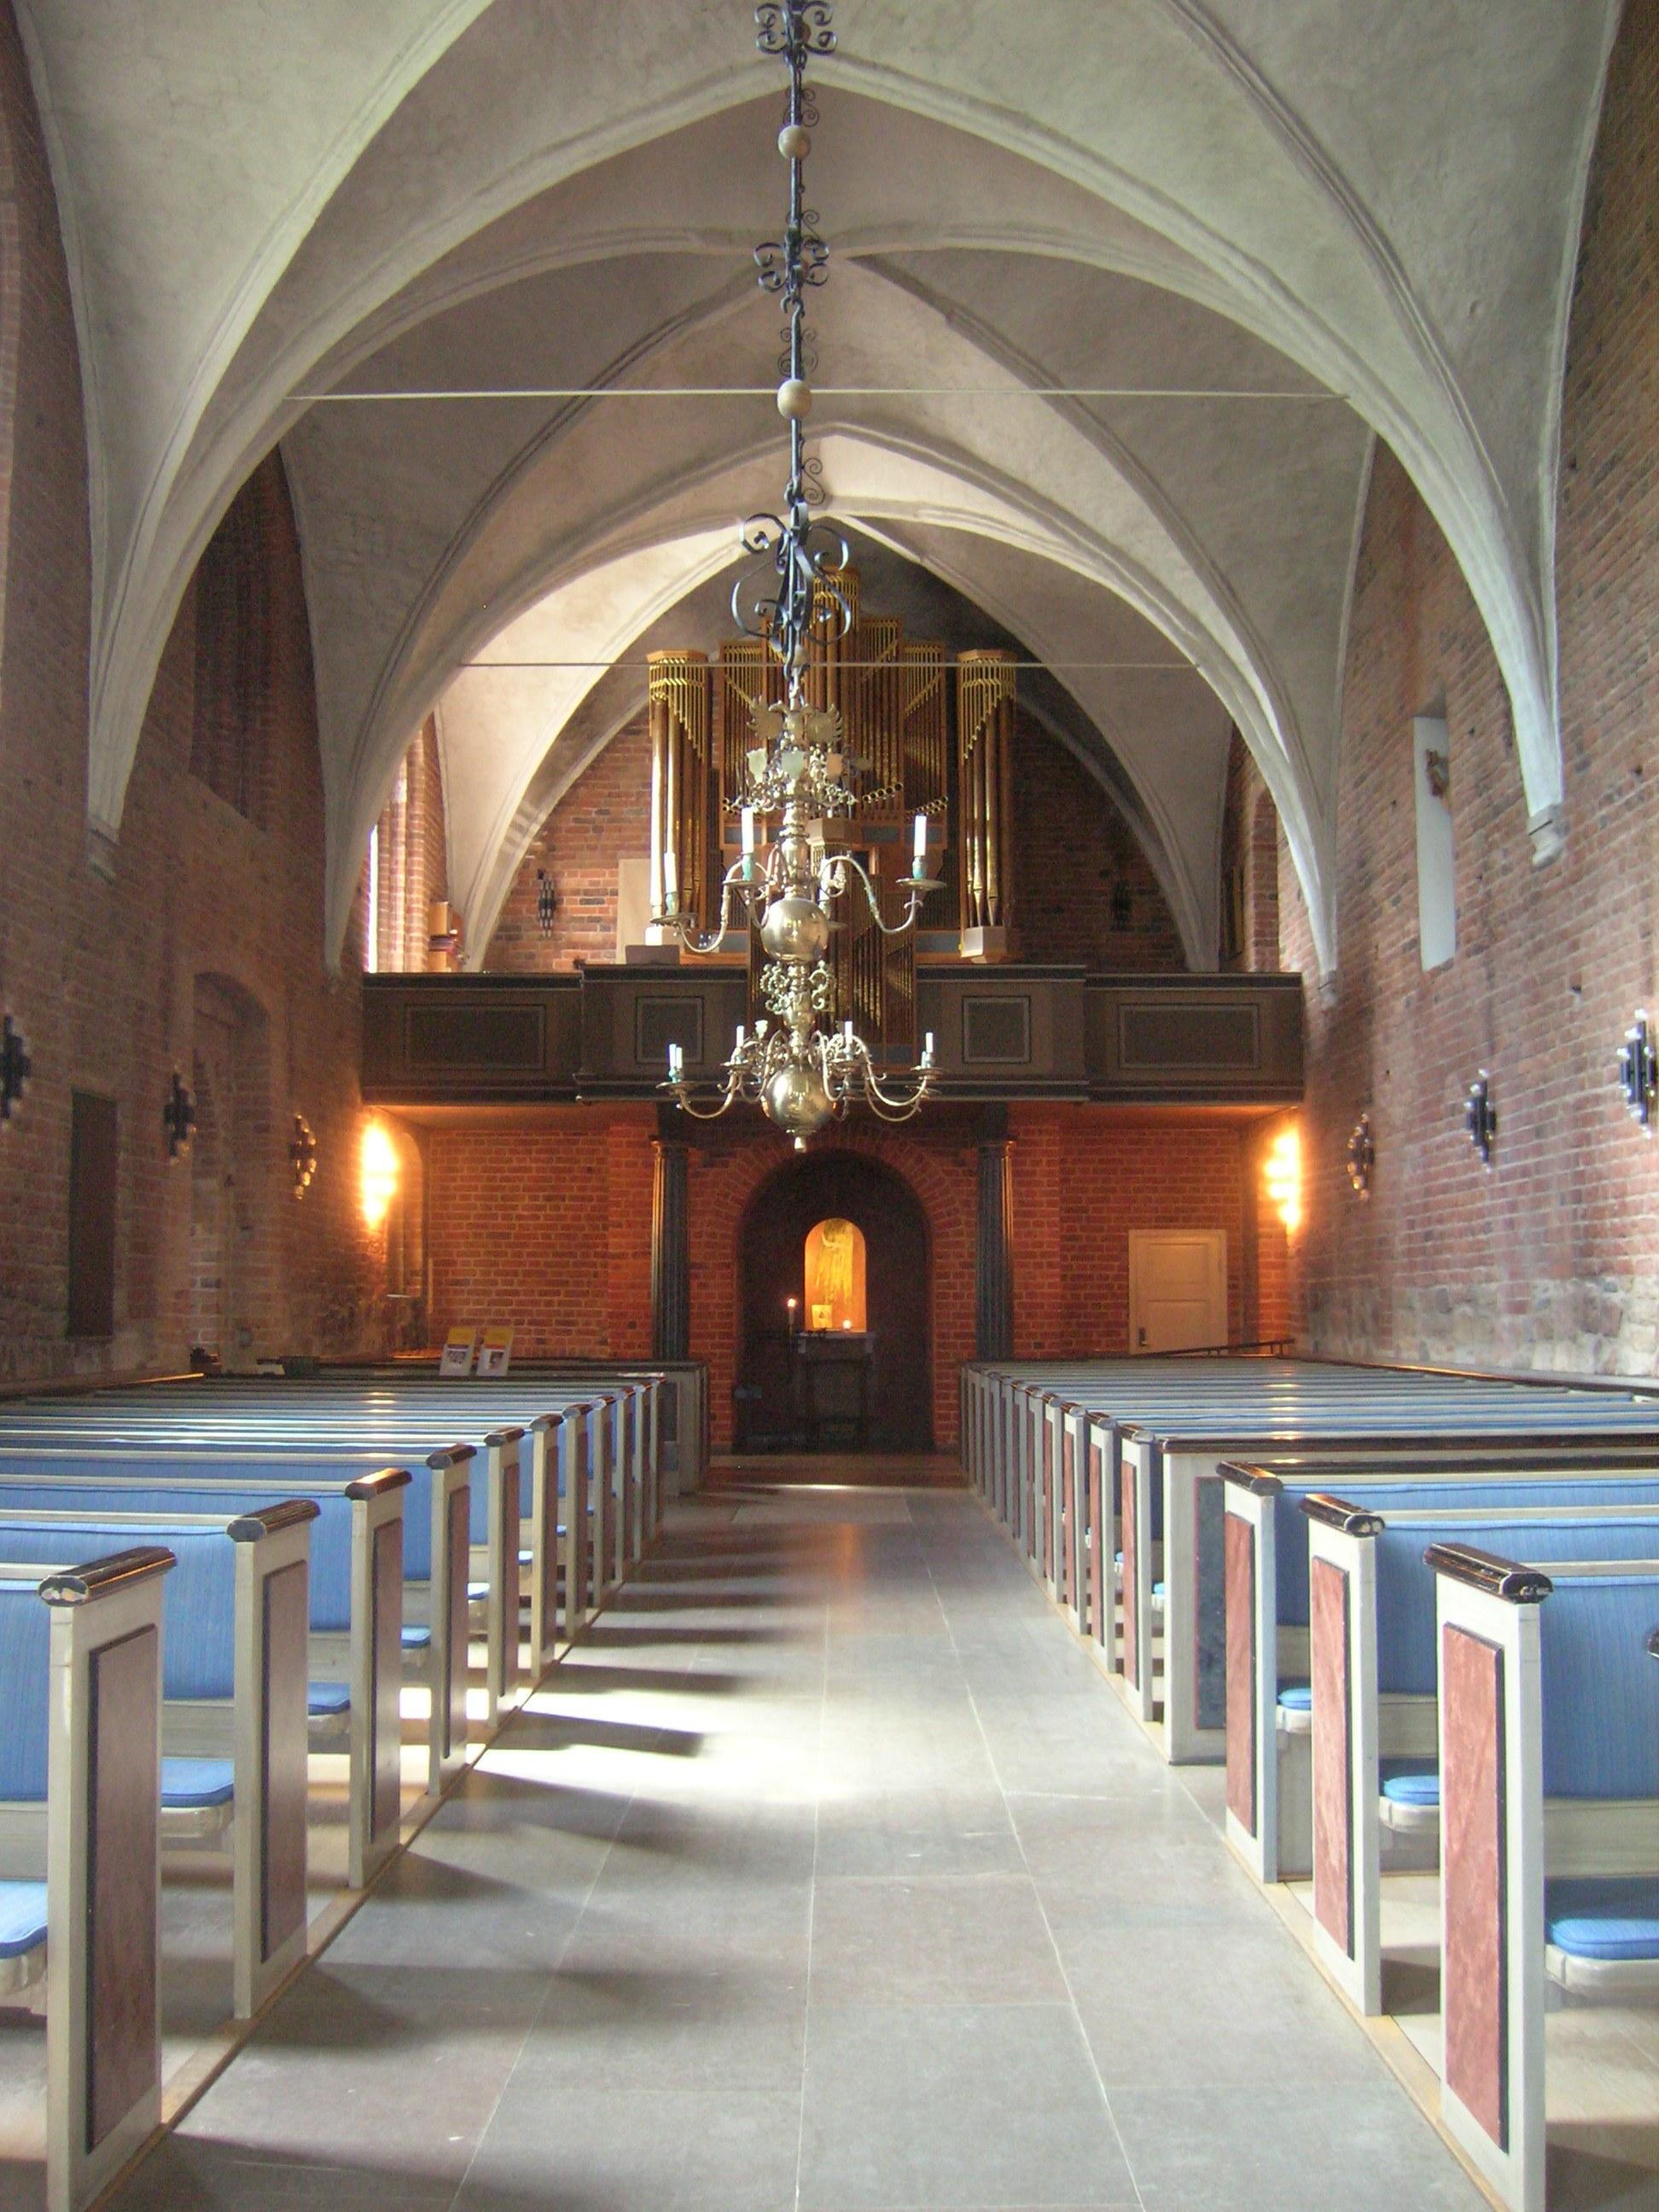 Sankt Peters klosters frsamling - Svenska kyrkan